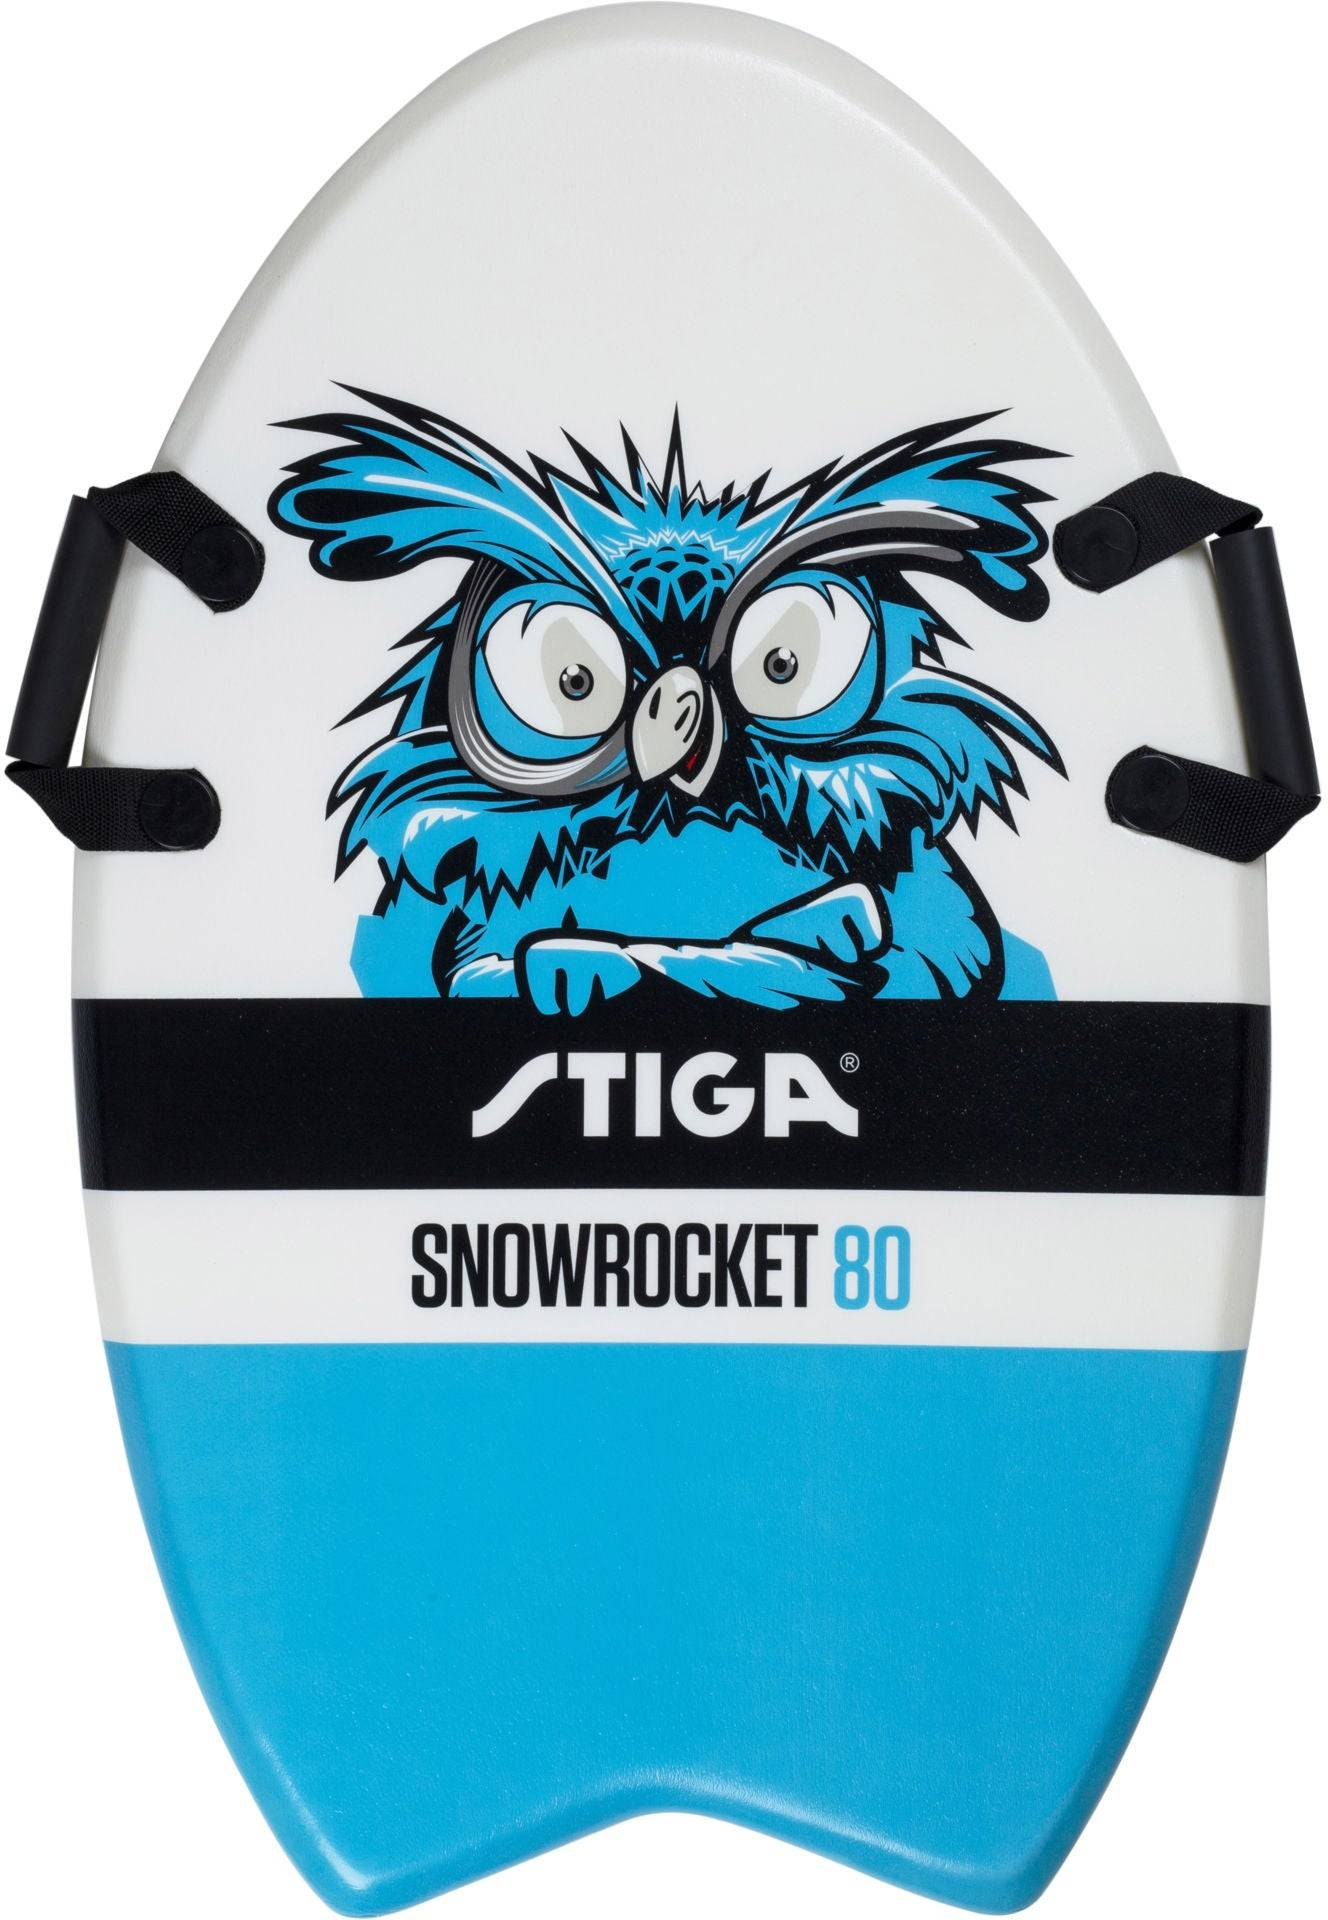 Stiga Foamboard Snowrocket Uggla, Blå